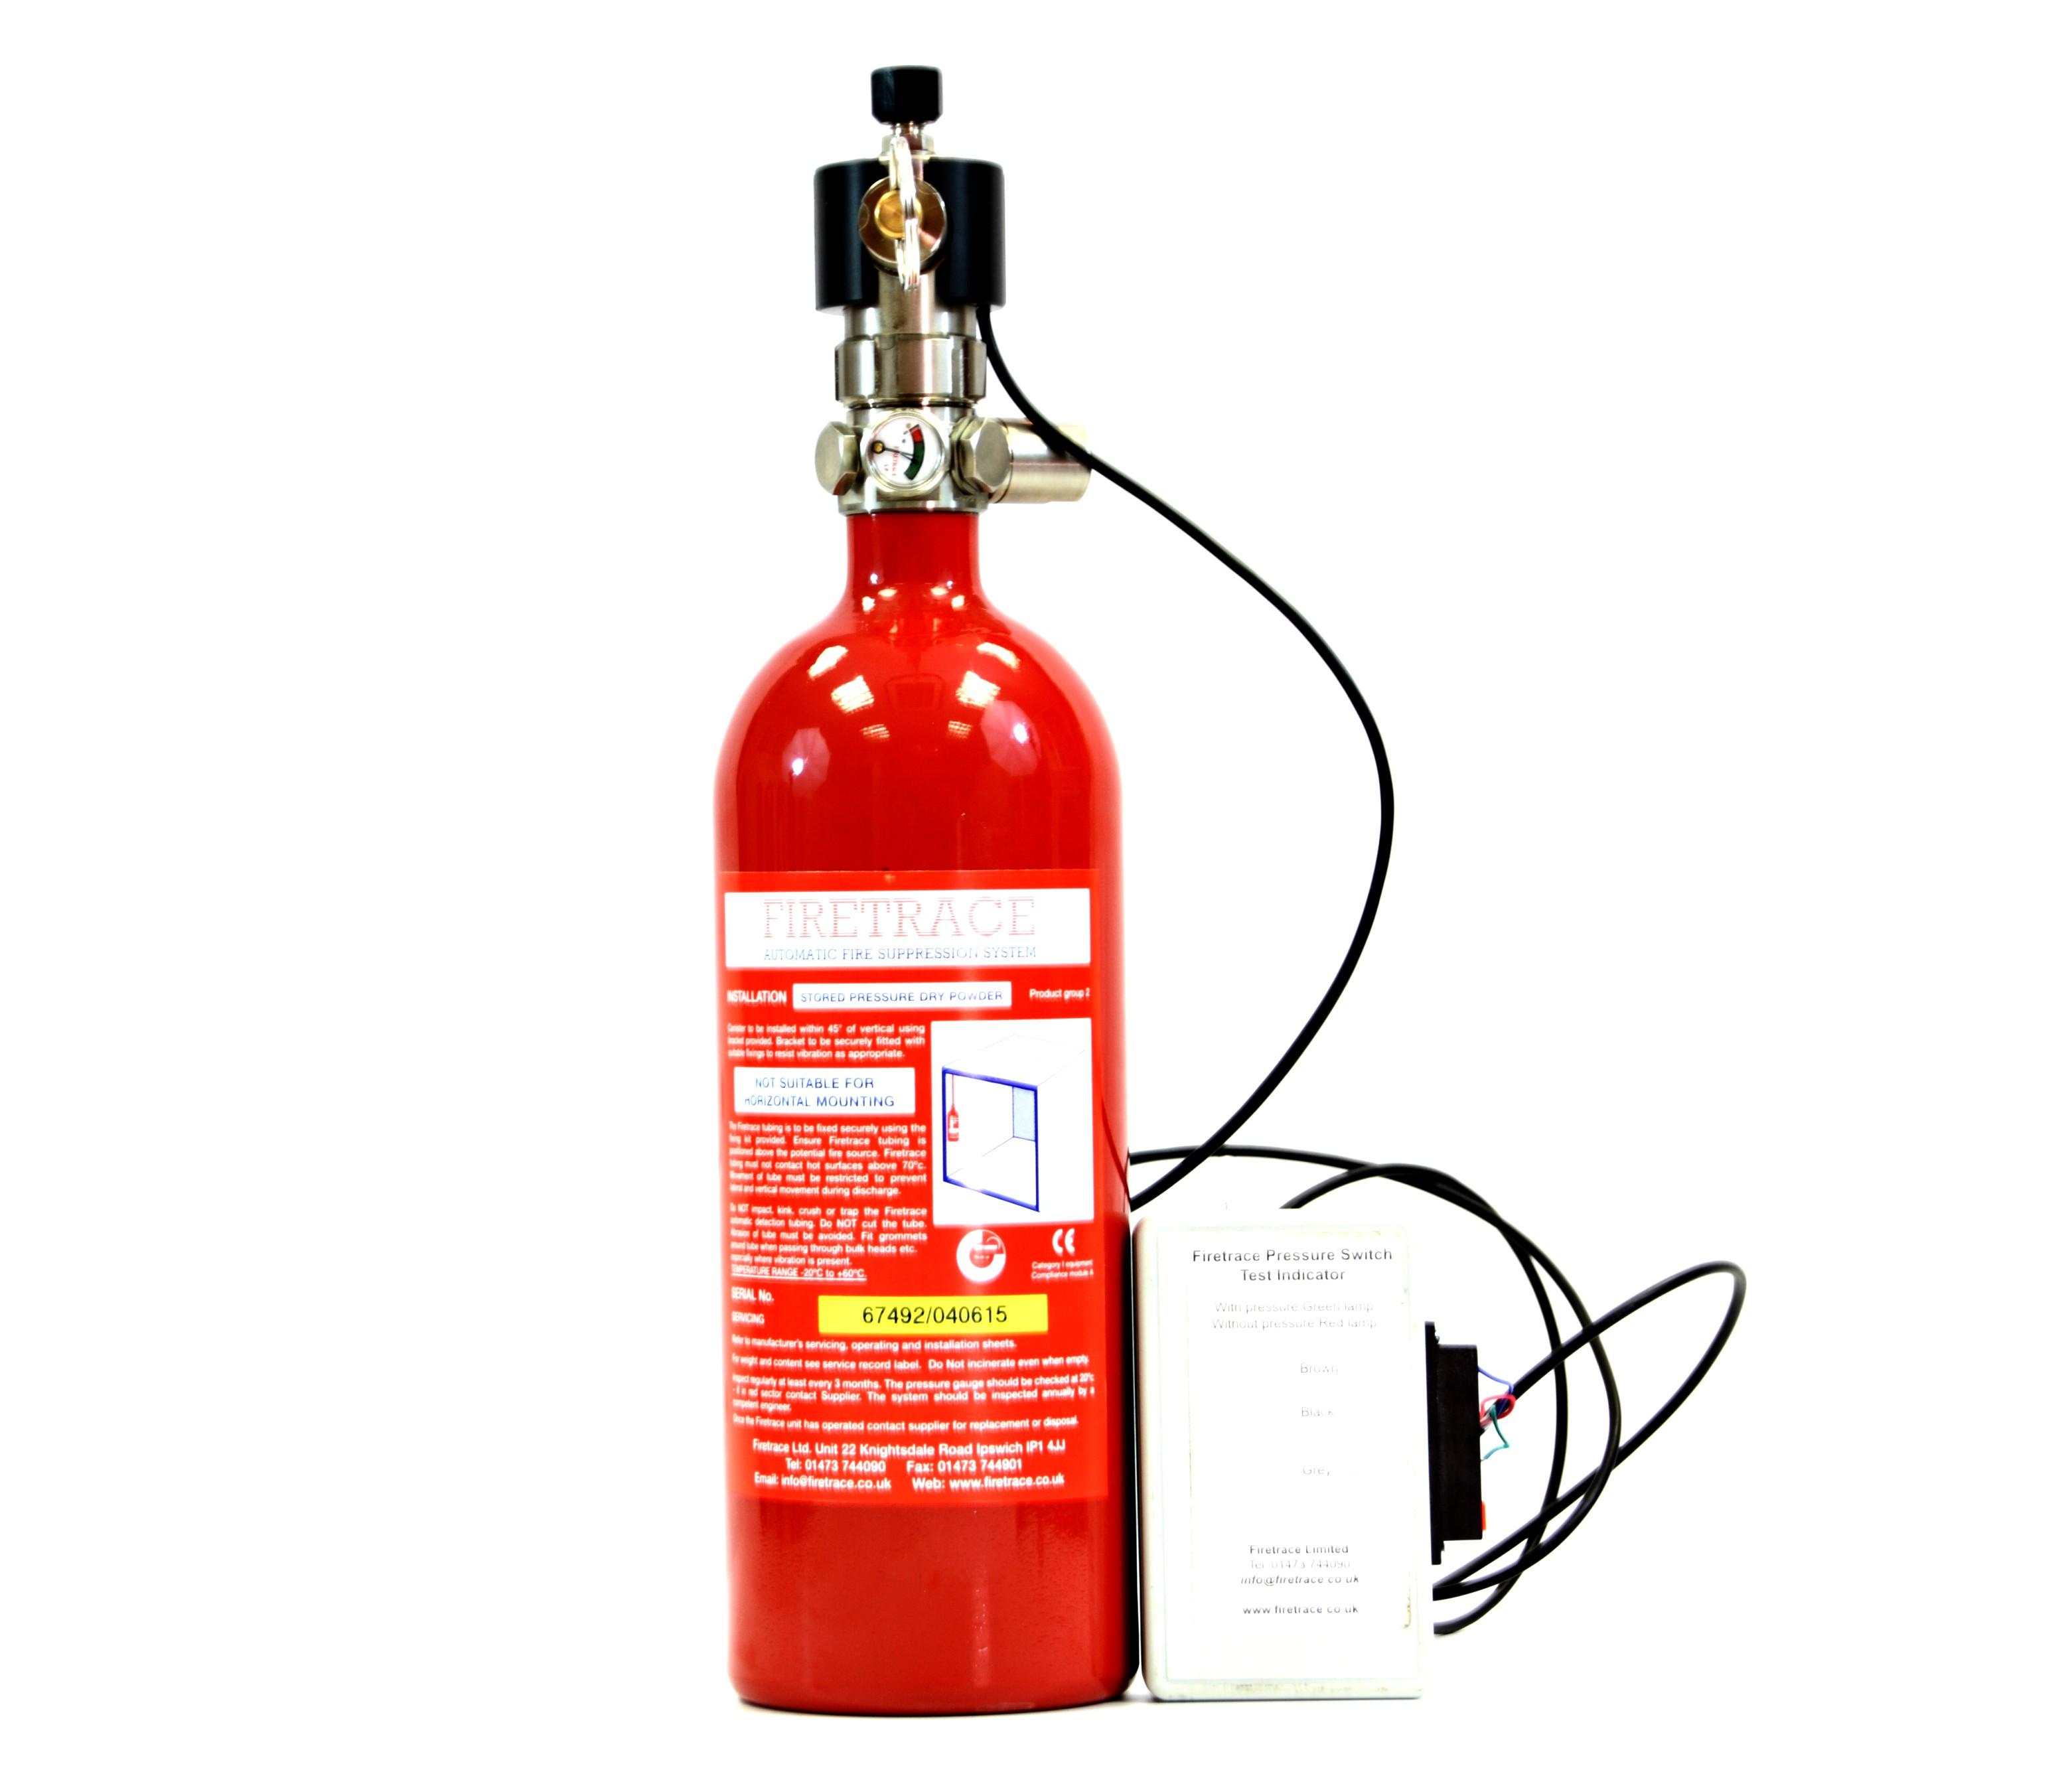 Status Indicator Module Firetrace Equipment Using Two Led Dpp 02482